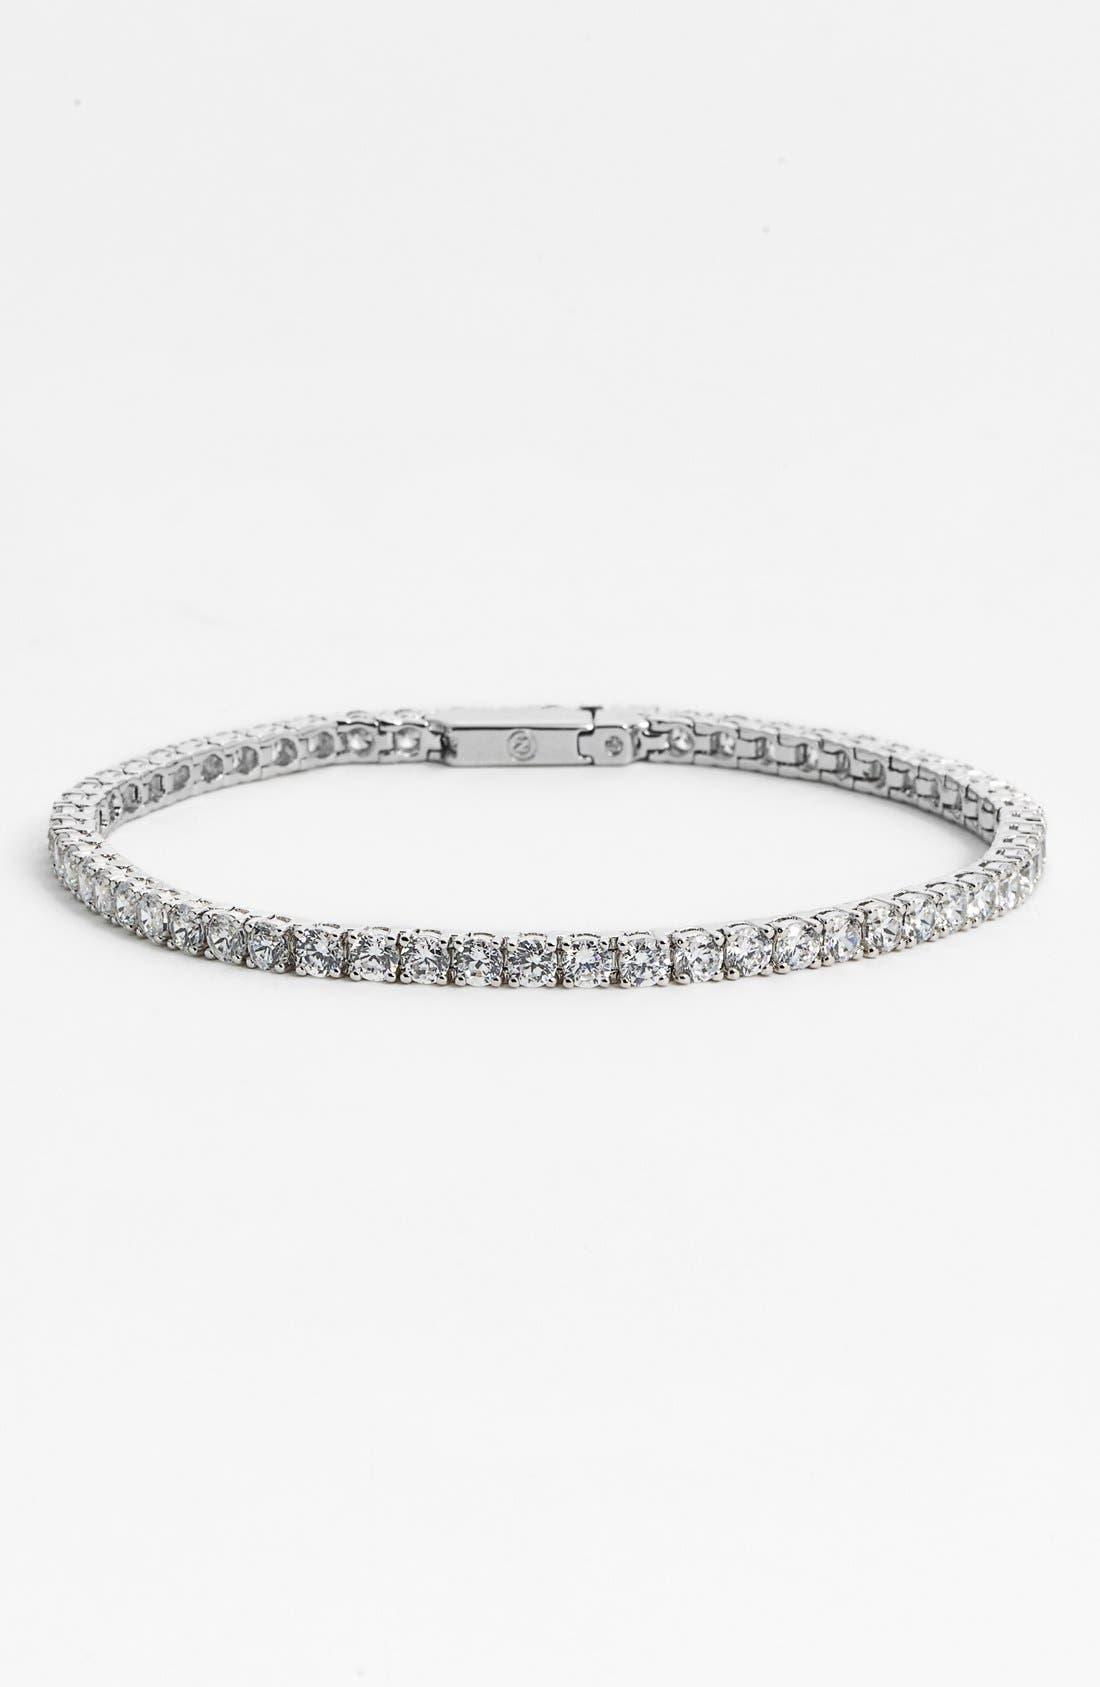 Nadri Small Tennis Bracelet